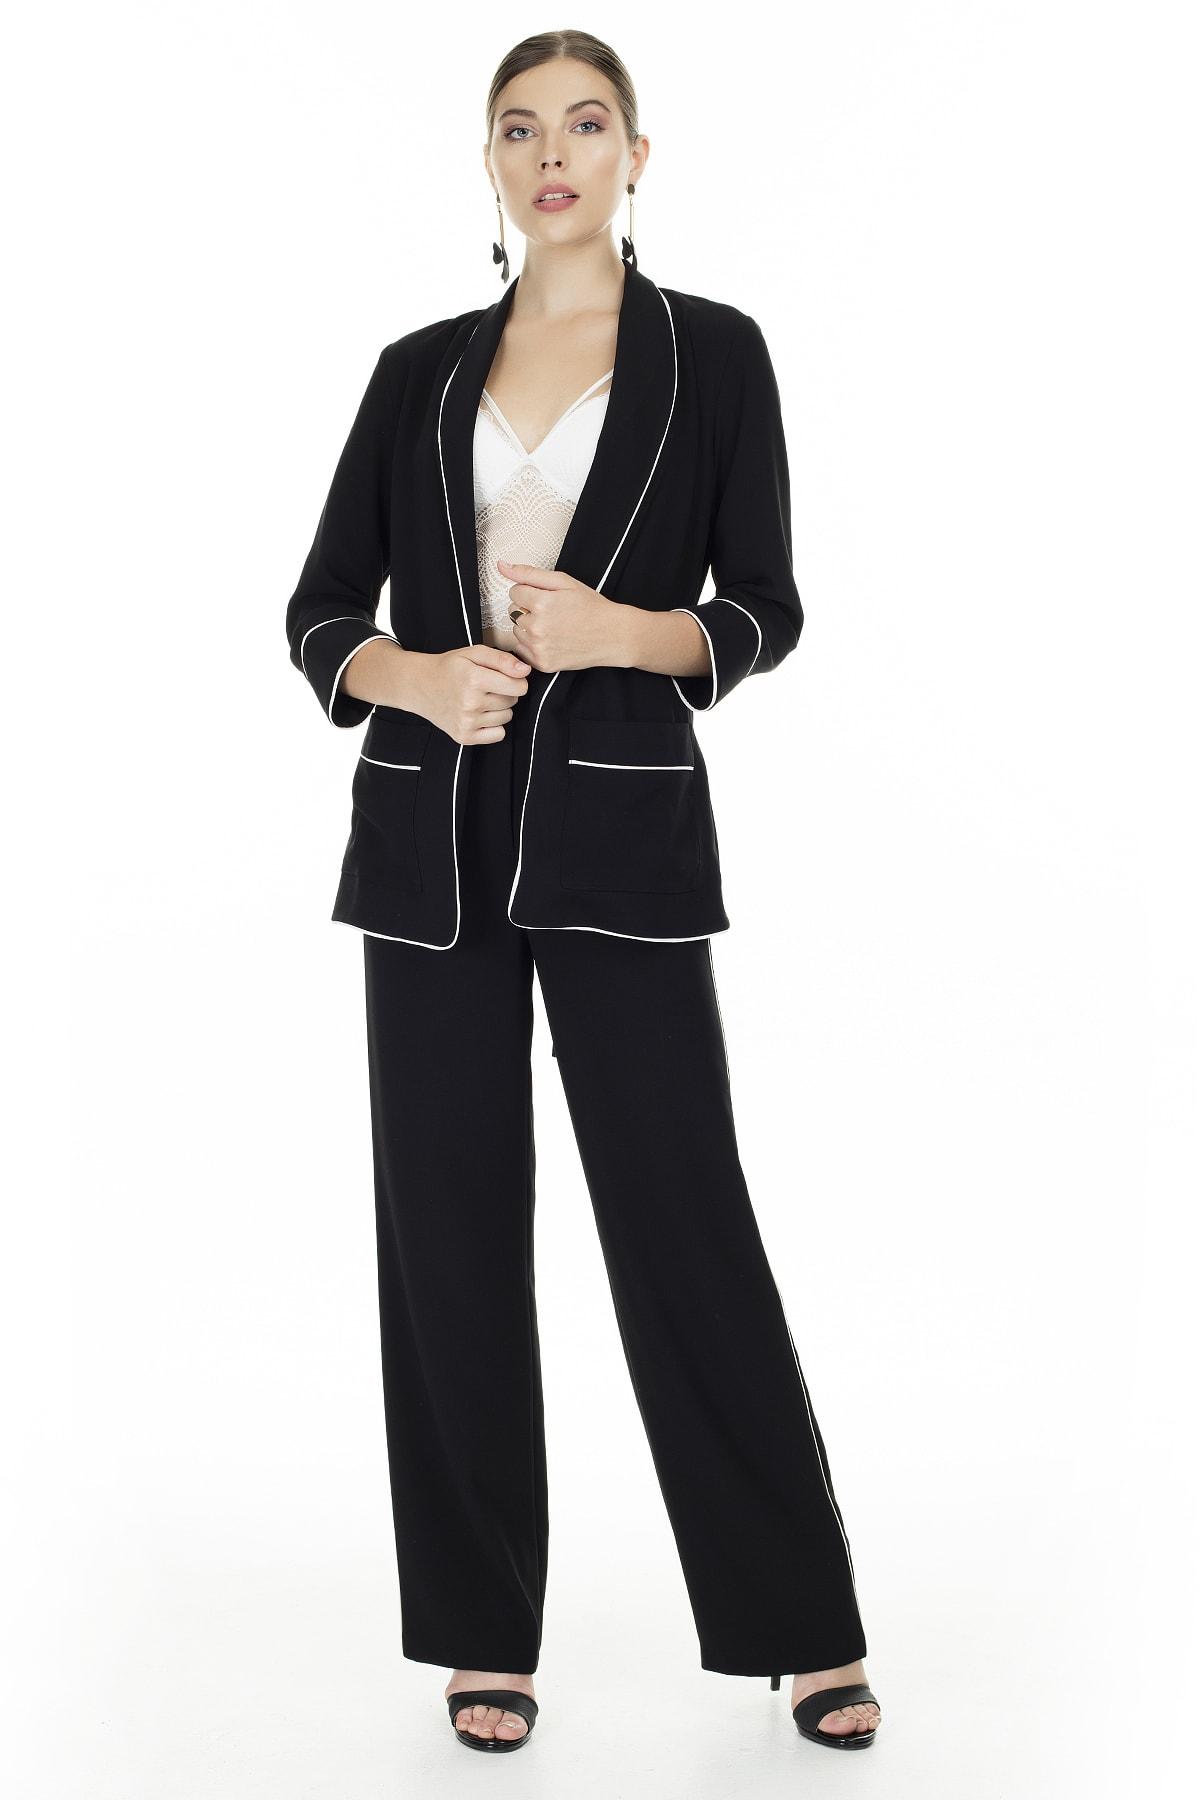 Ayhan Siyah Yüksek Bel Pantolon Kadın Pantolon 0467990